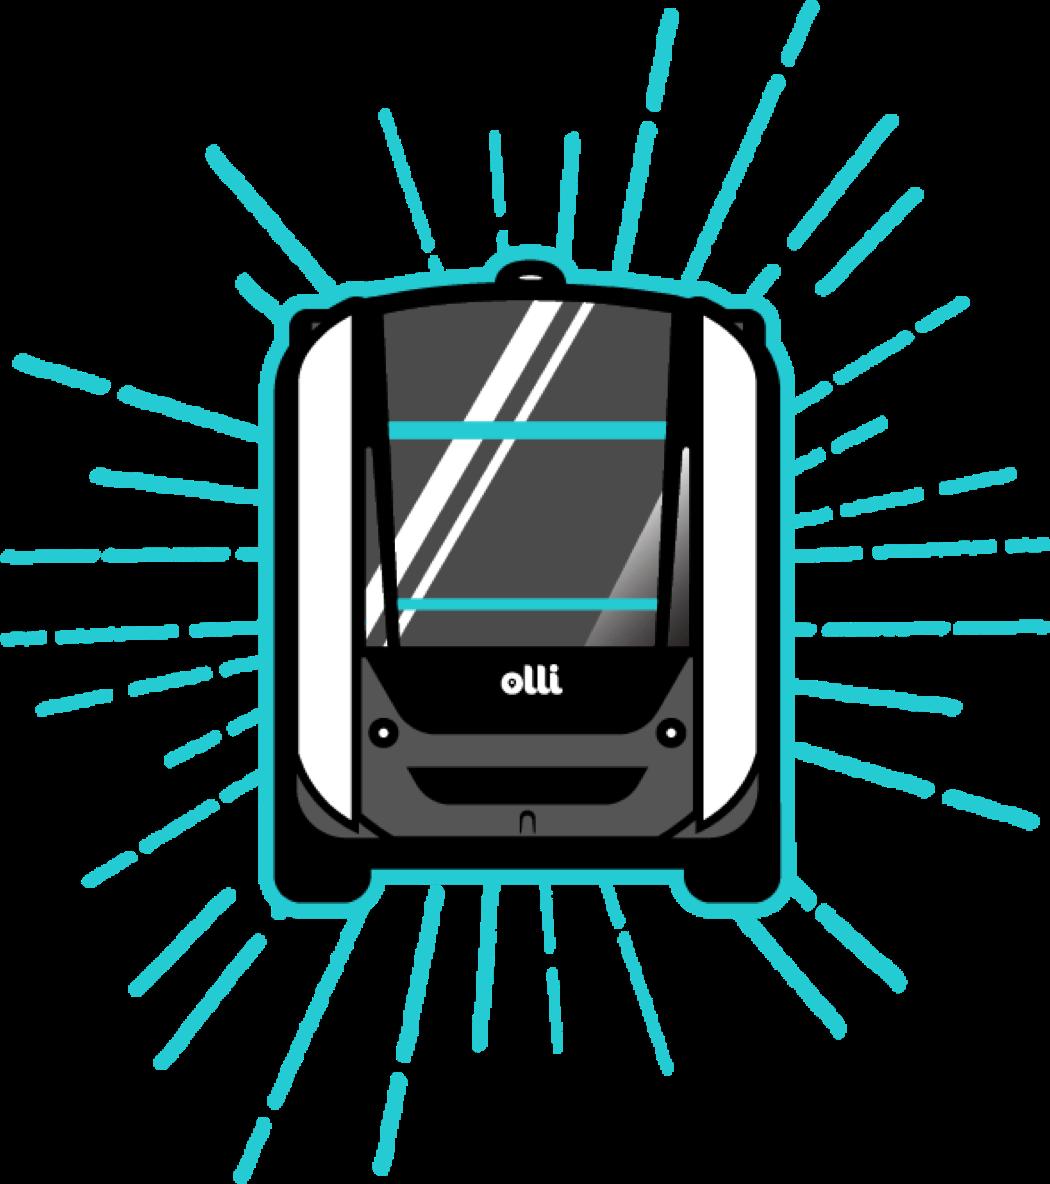 Olli forward thinking transportation. Driving clipart horsepower